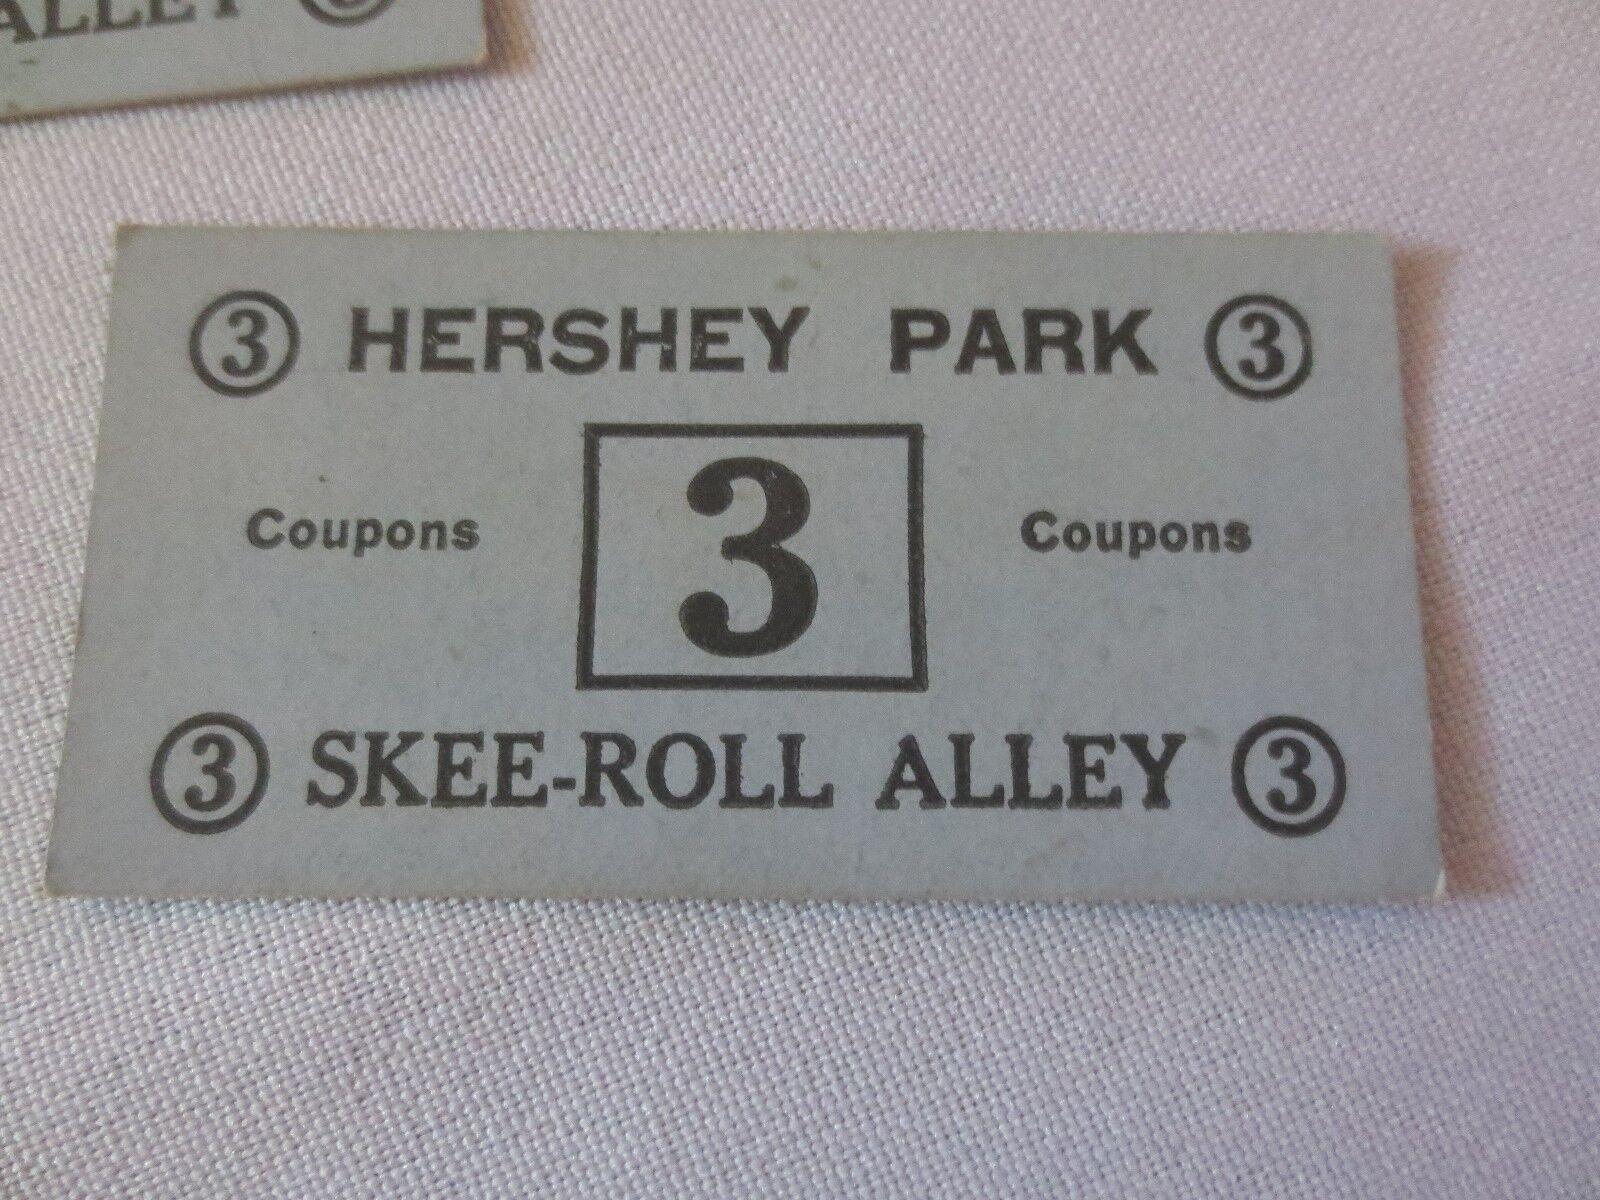 Hershey park ticket discount coupons